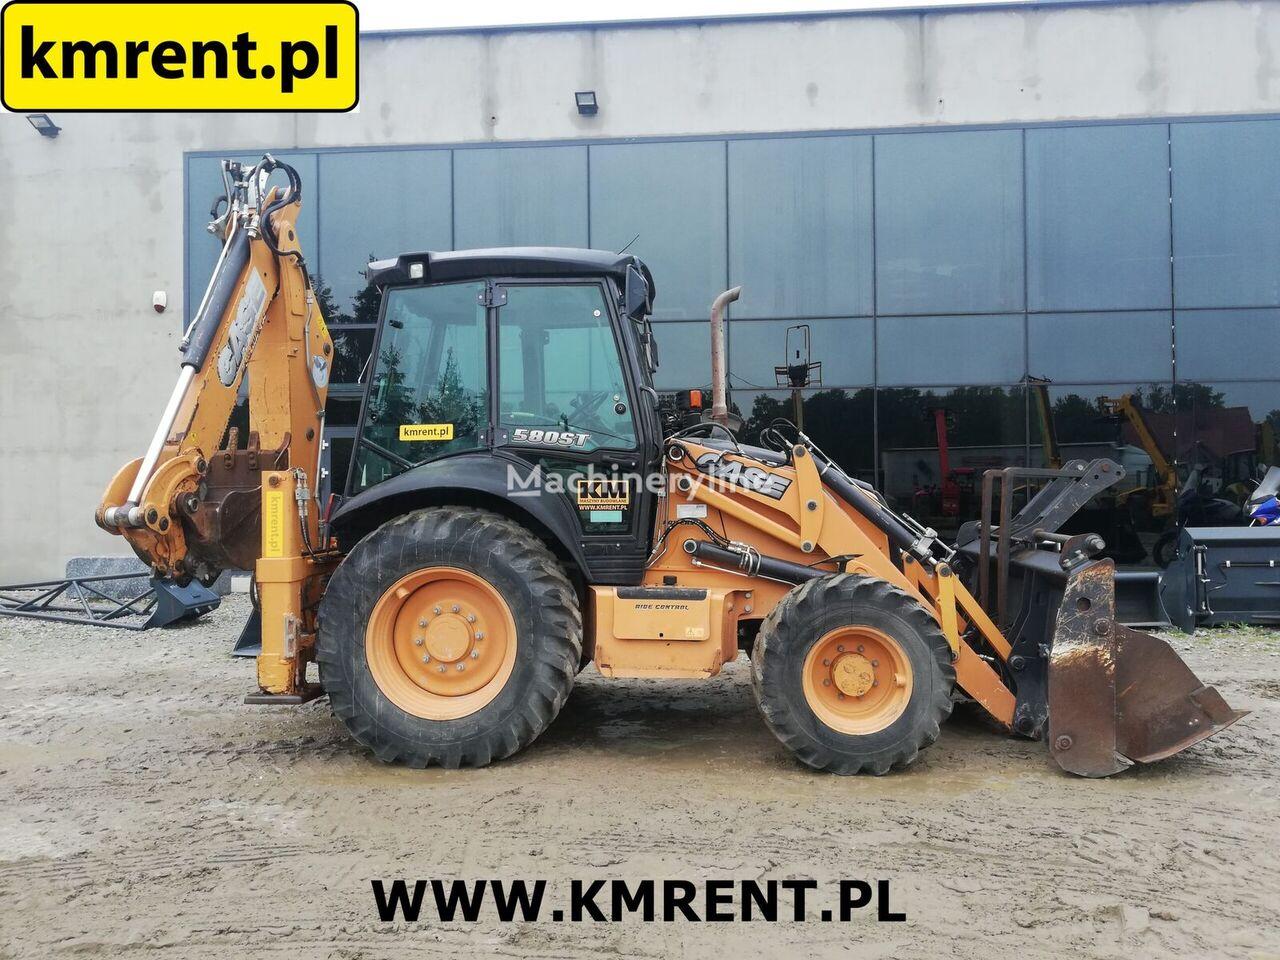 CASE 580 ST | 590 JCB 3CX CAT 432 428 VOLVO BL 71 61 TEREX 880 890  retroexcavadora